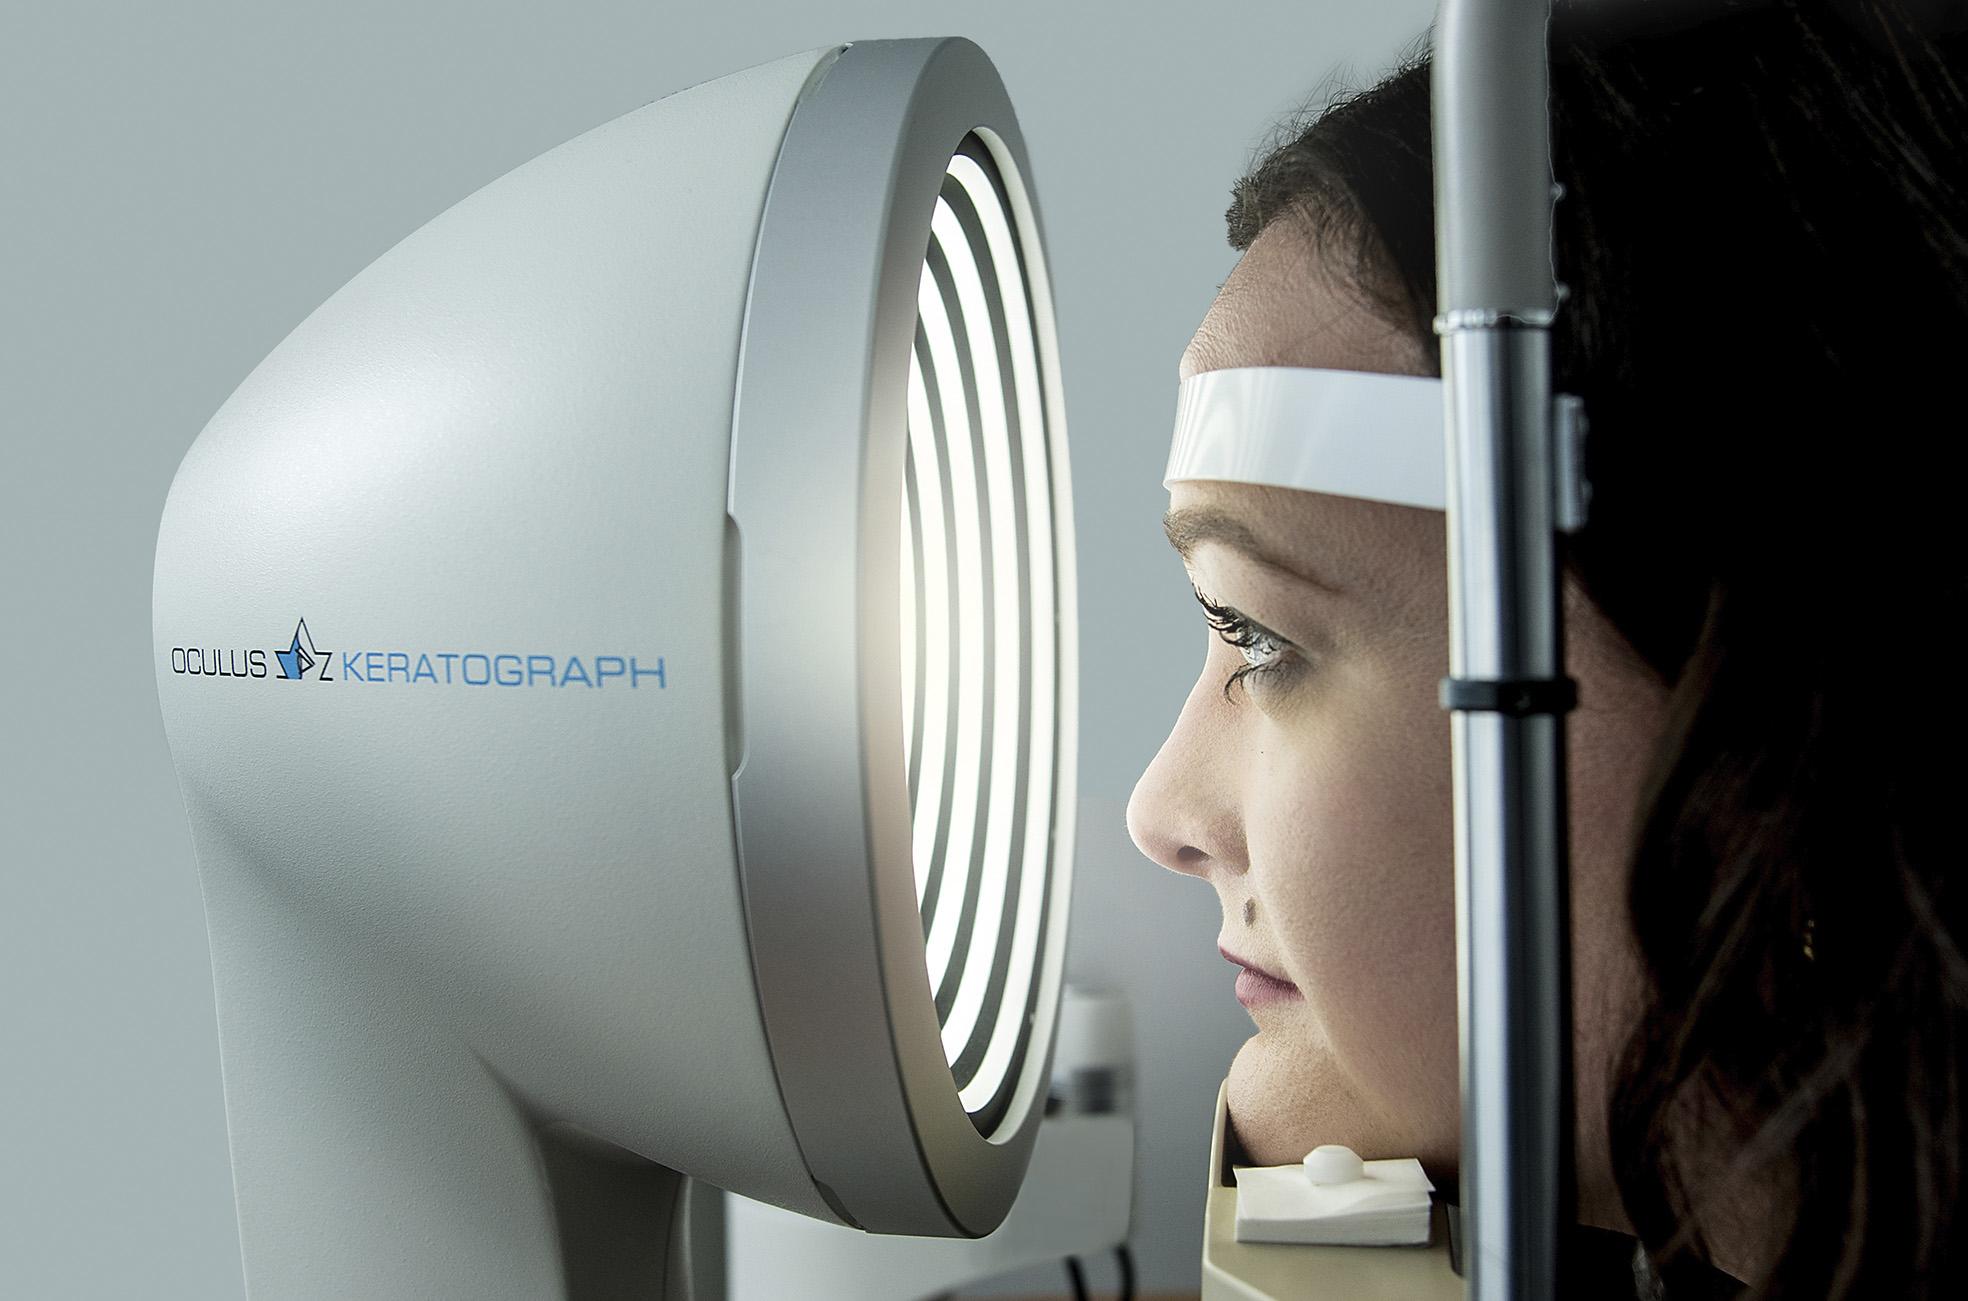 Kontaklinsen-Anpassung_Keratograph-Messung_Andre-Augenoptik